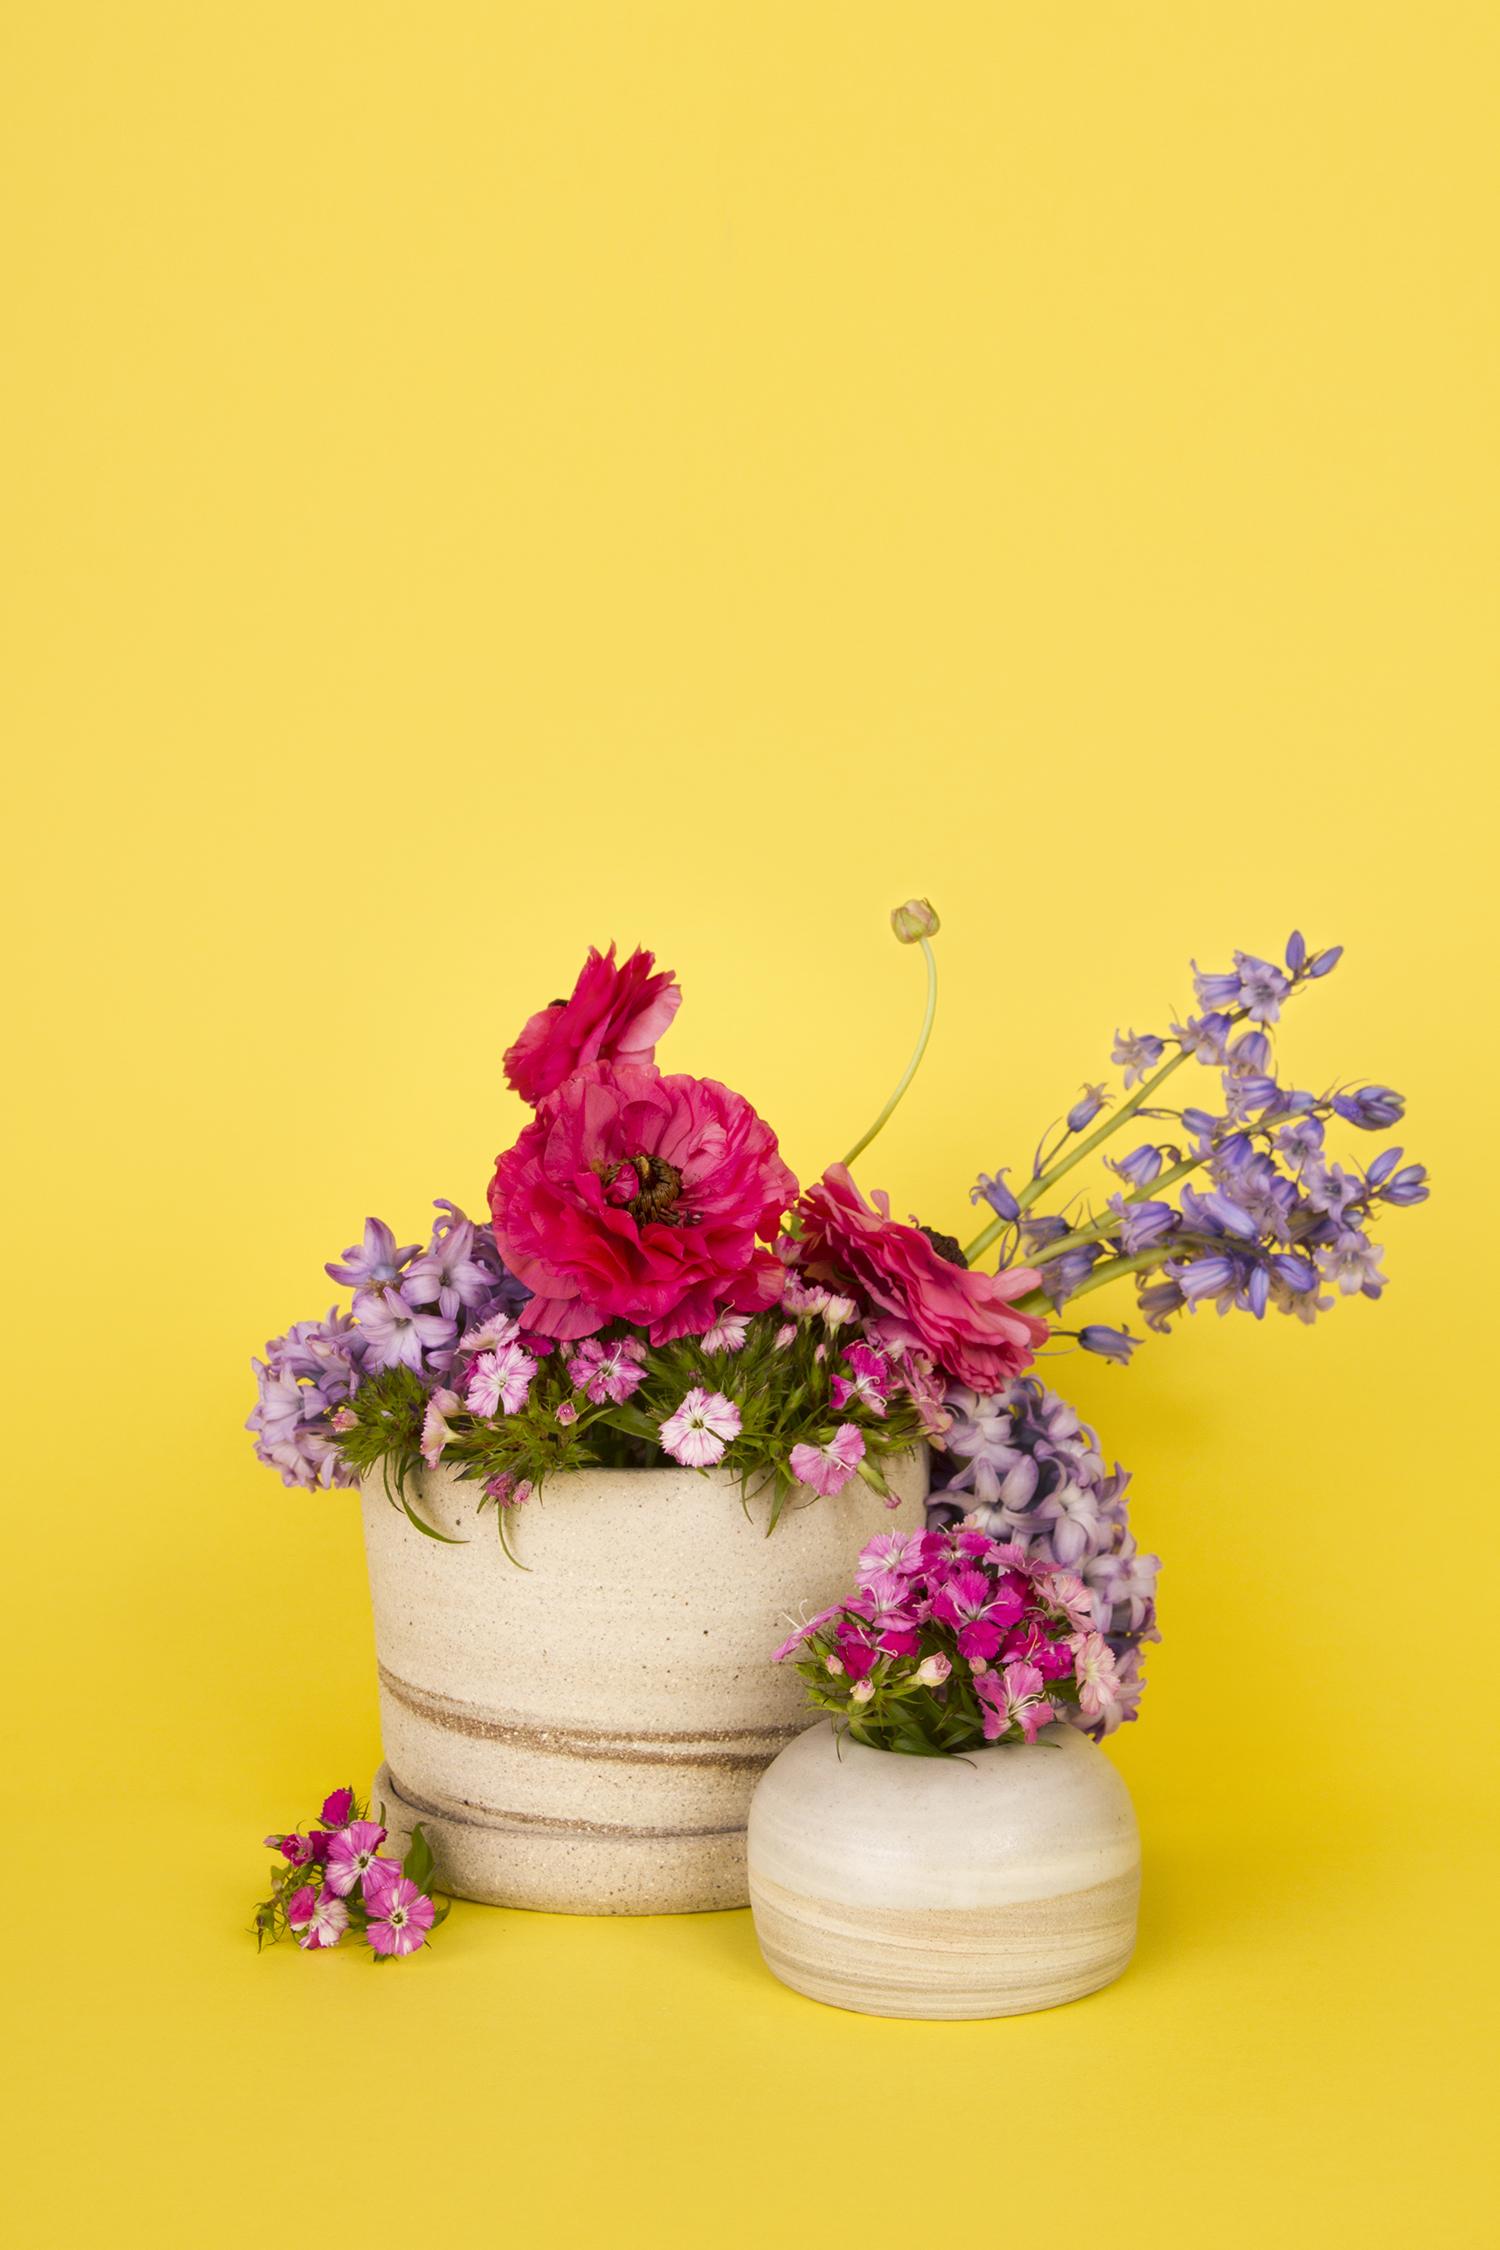 Tirant-Floral-Shoot-2016-000.jpg